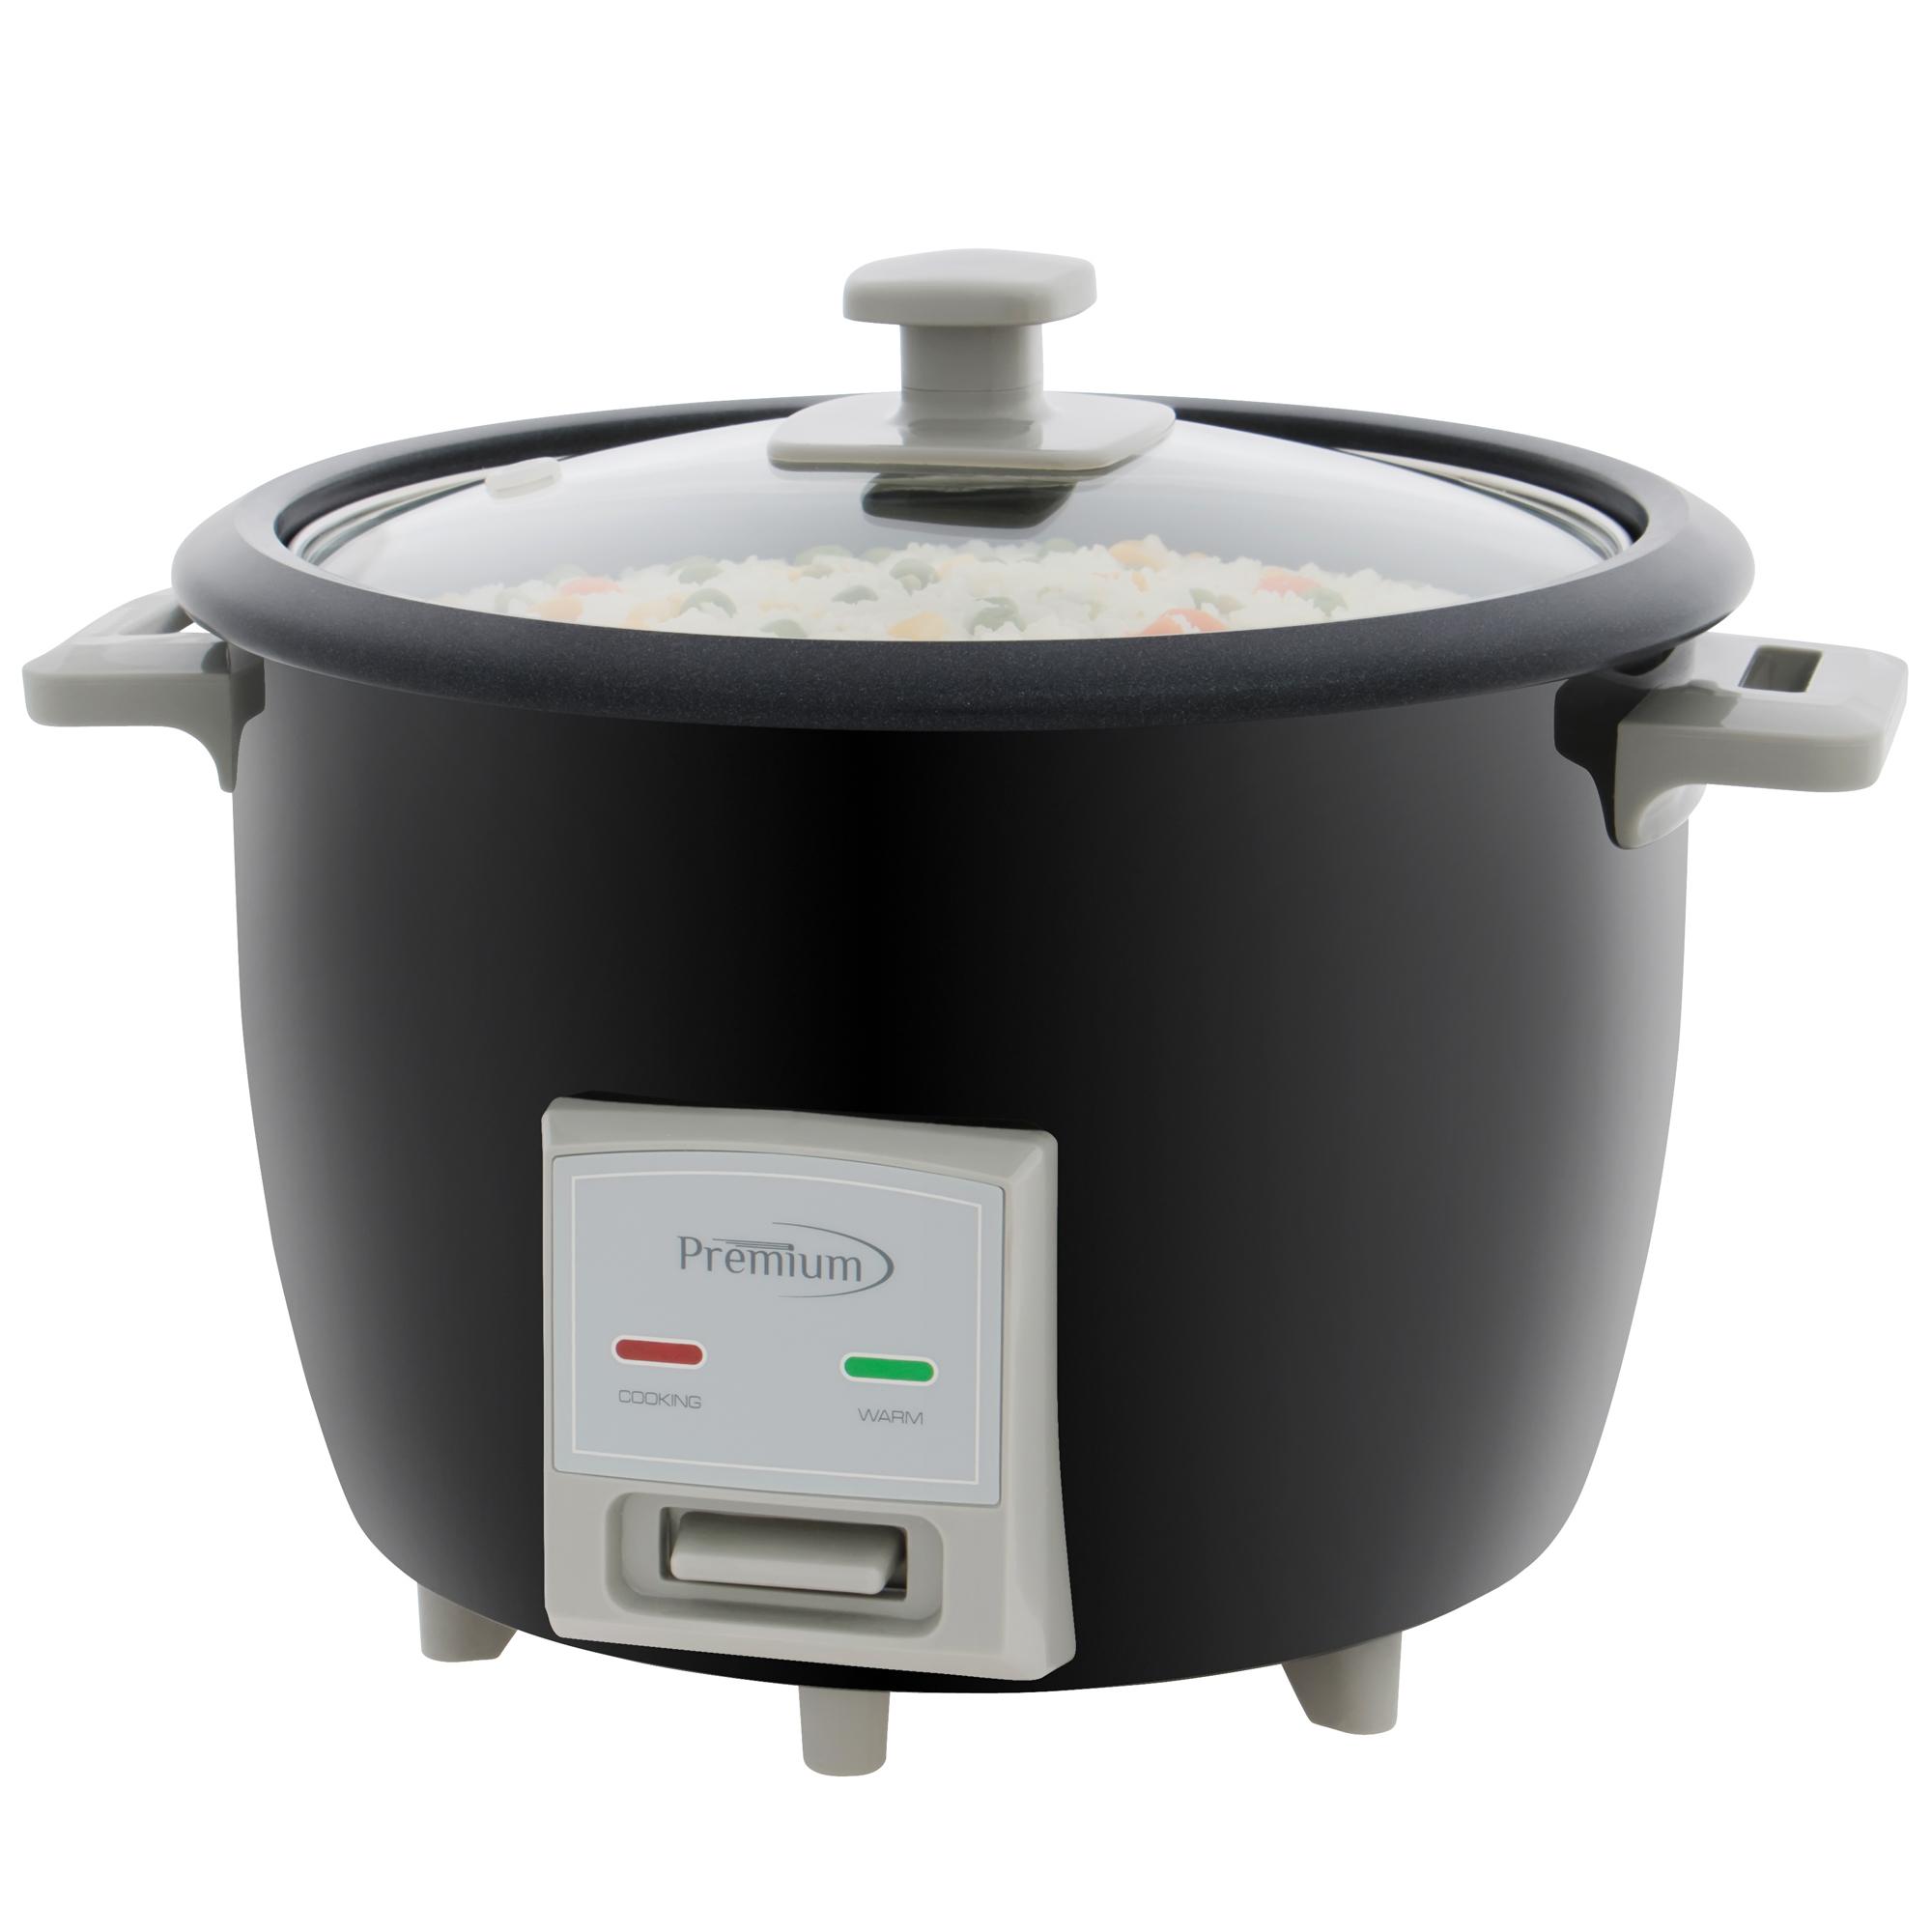 Premium Appliances 20 Cup Rice Cooker